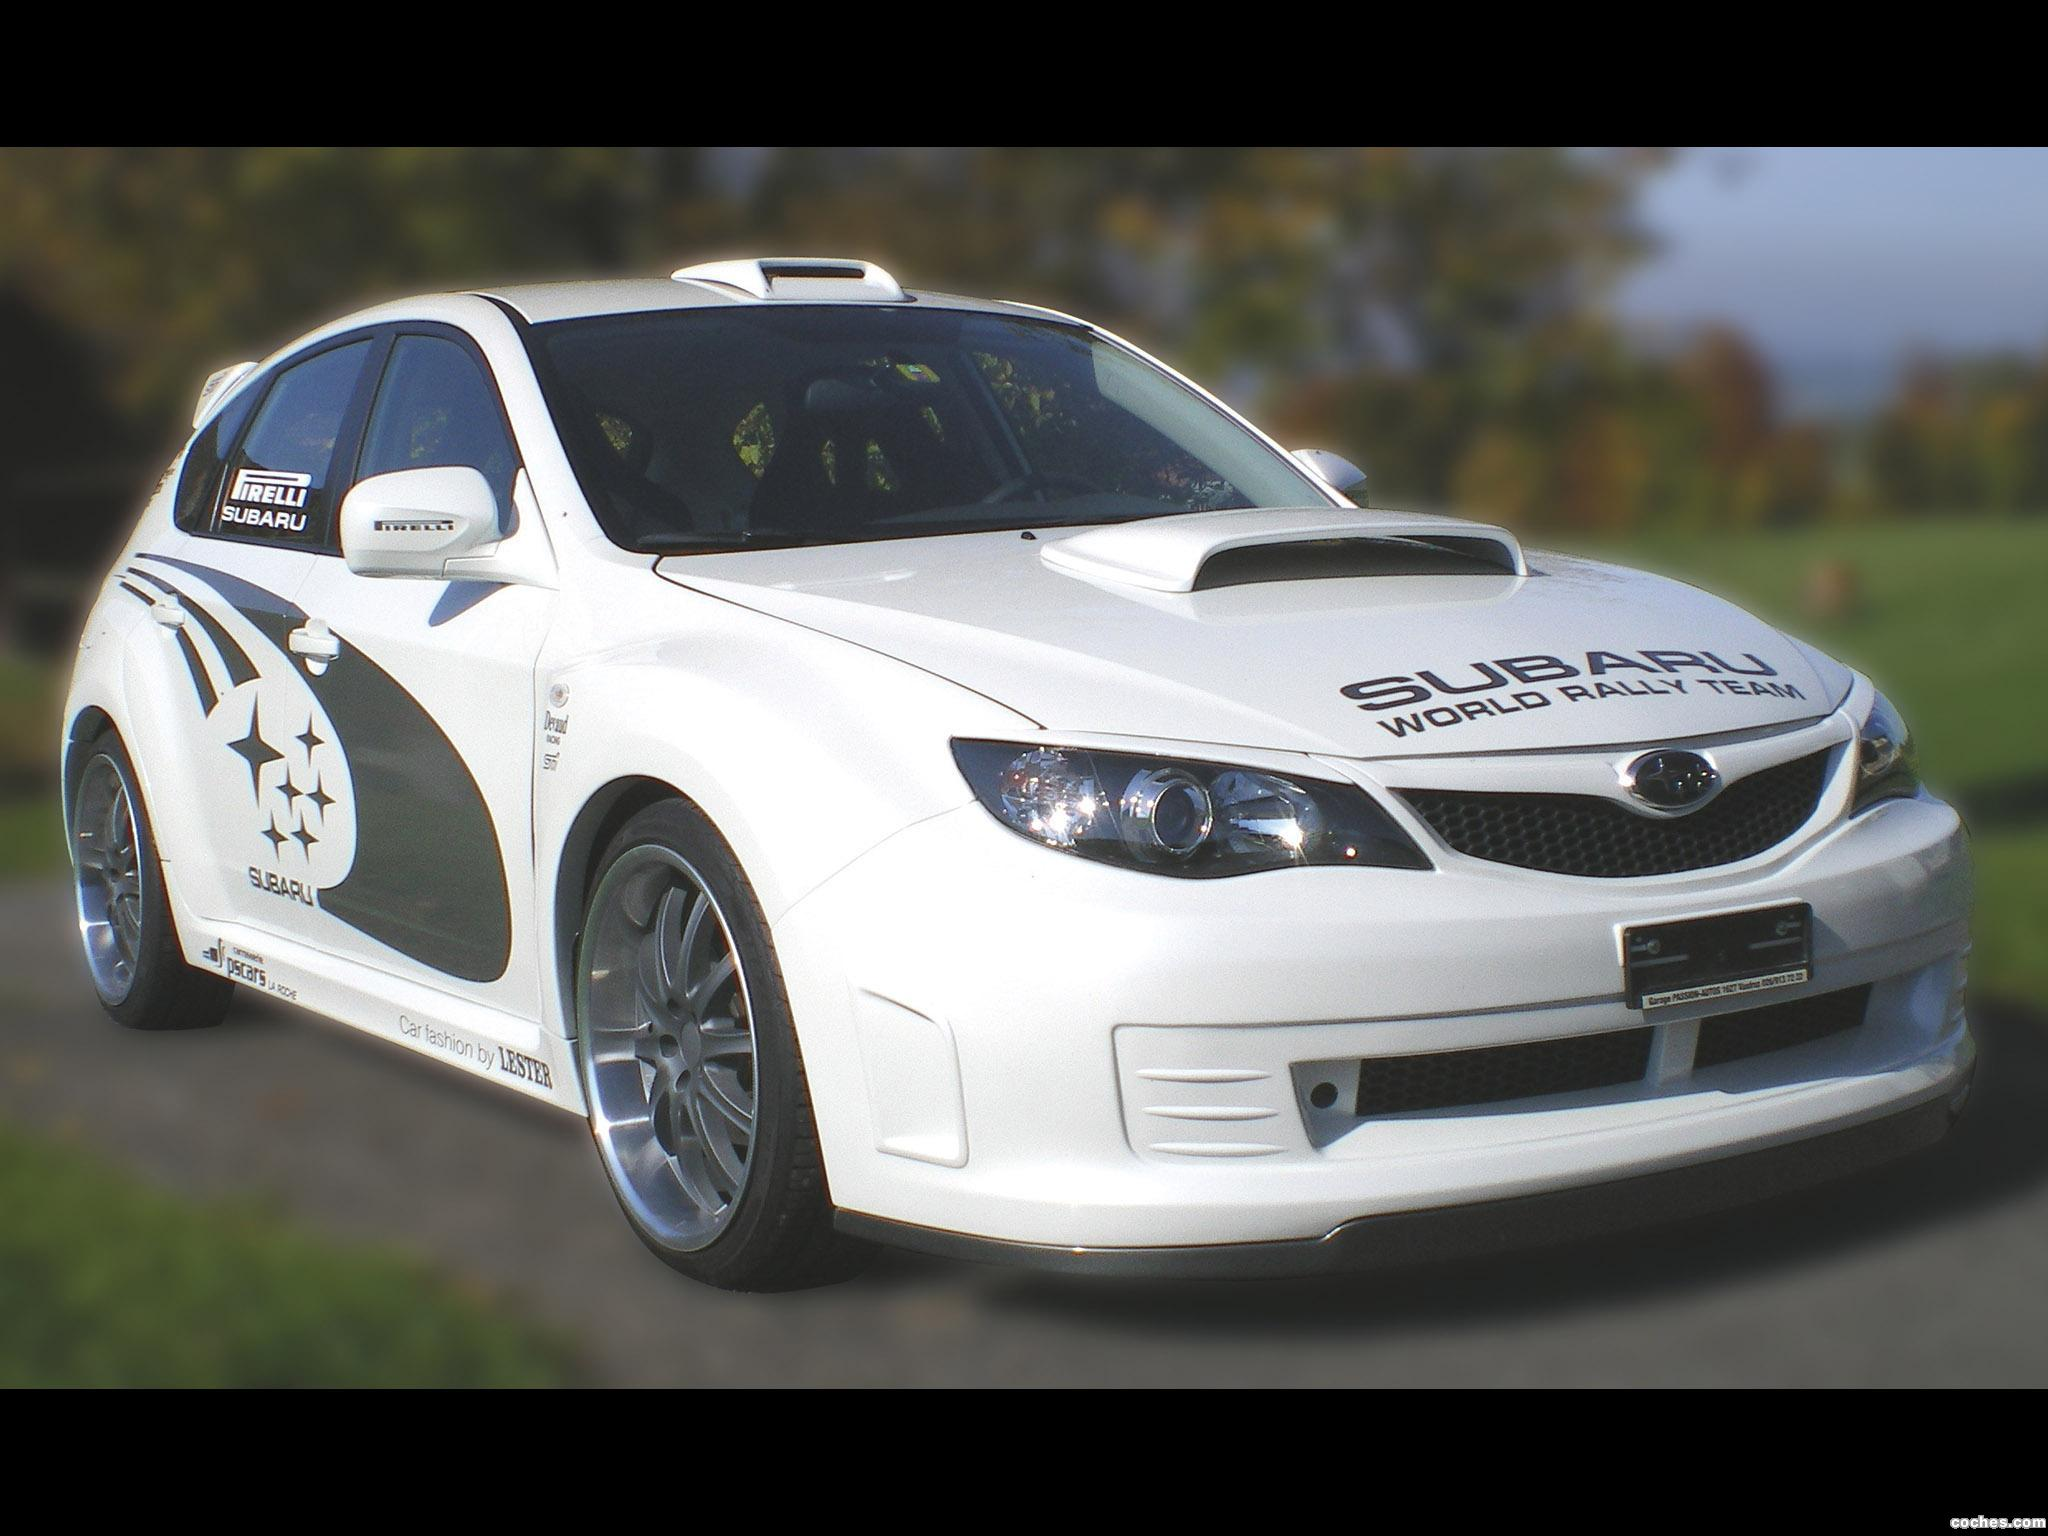 Foto 0 de Subaru lester Impreza STi 2010